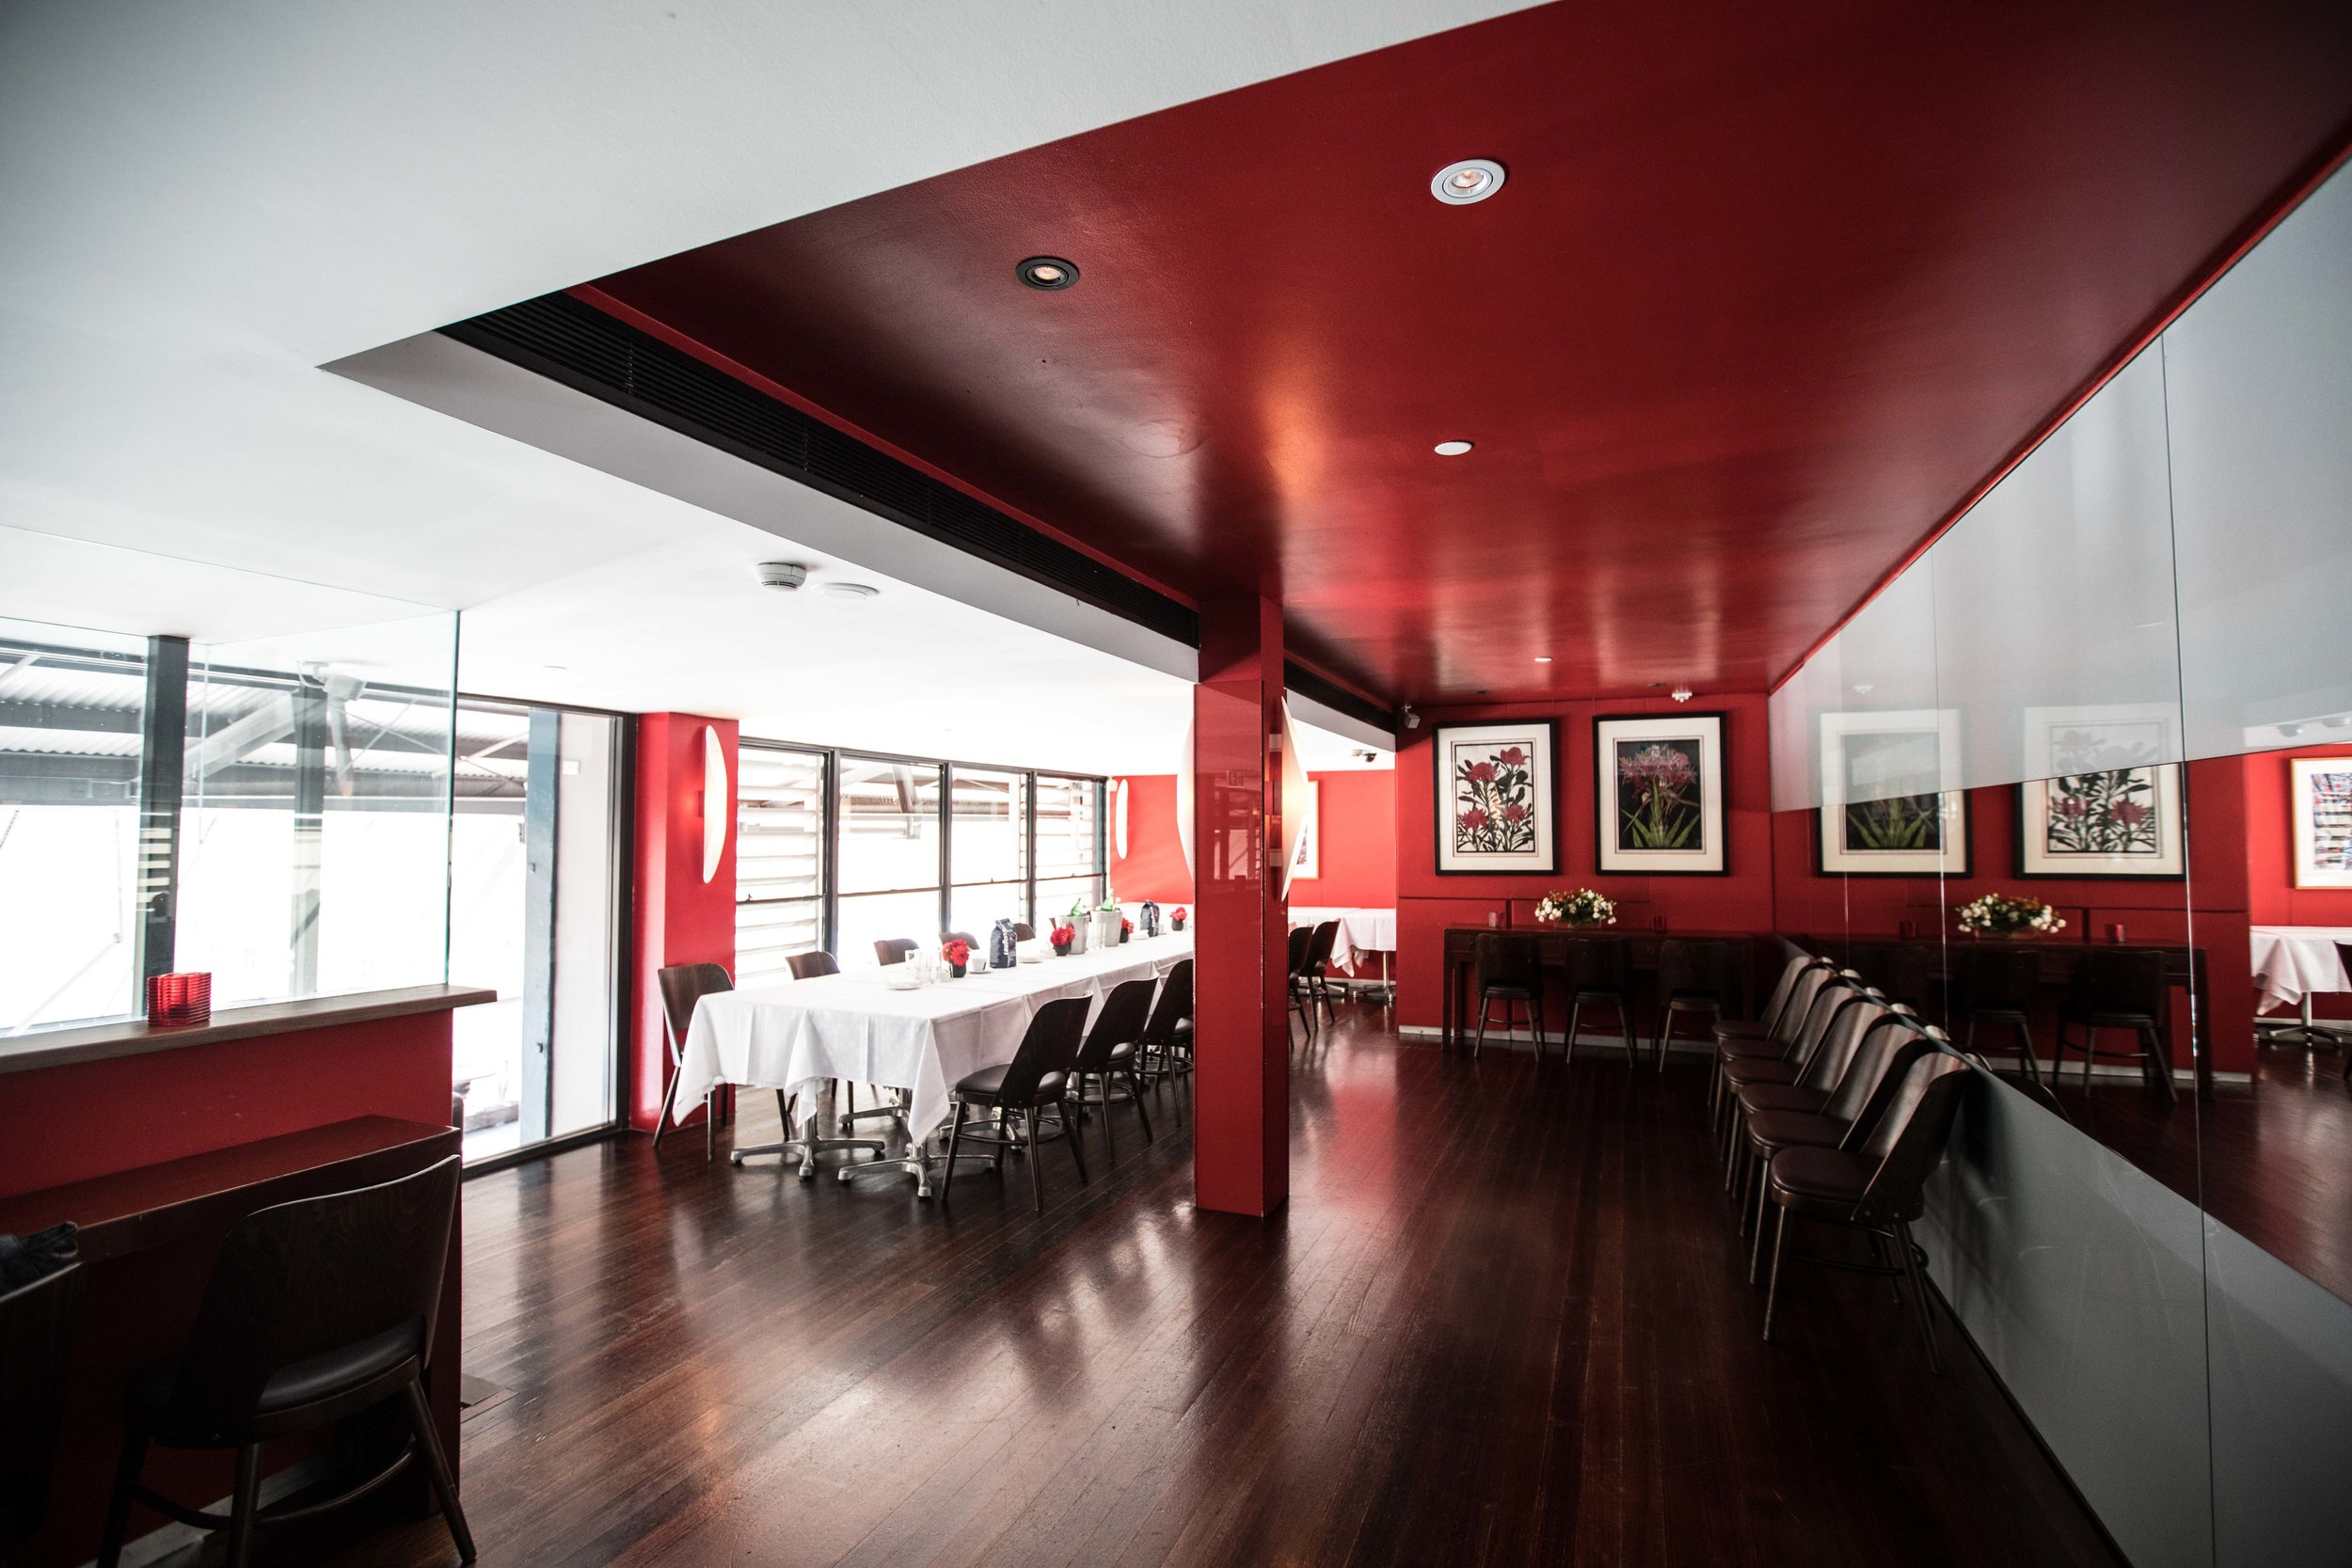 lavazza-massimo-bottura-worlds-50-best-restaurants-awards-2017-otto-4.jpg